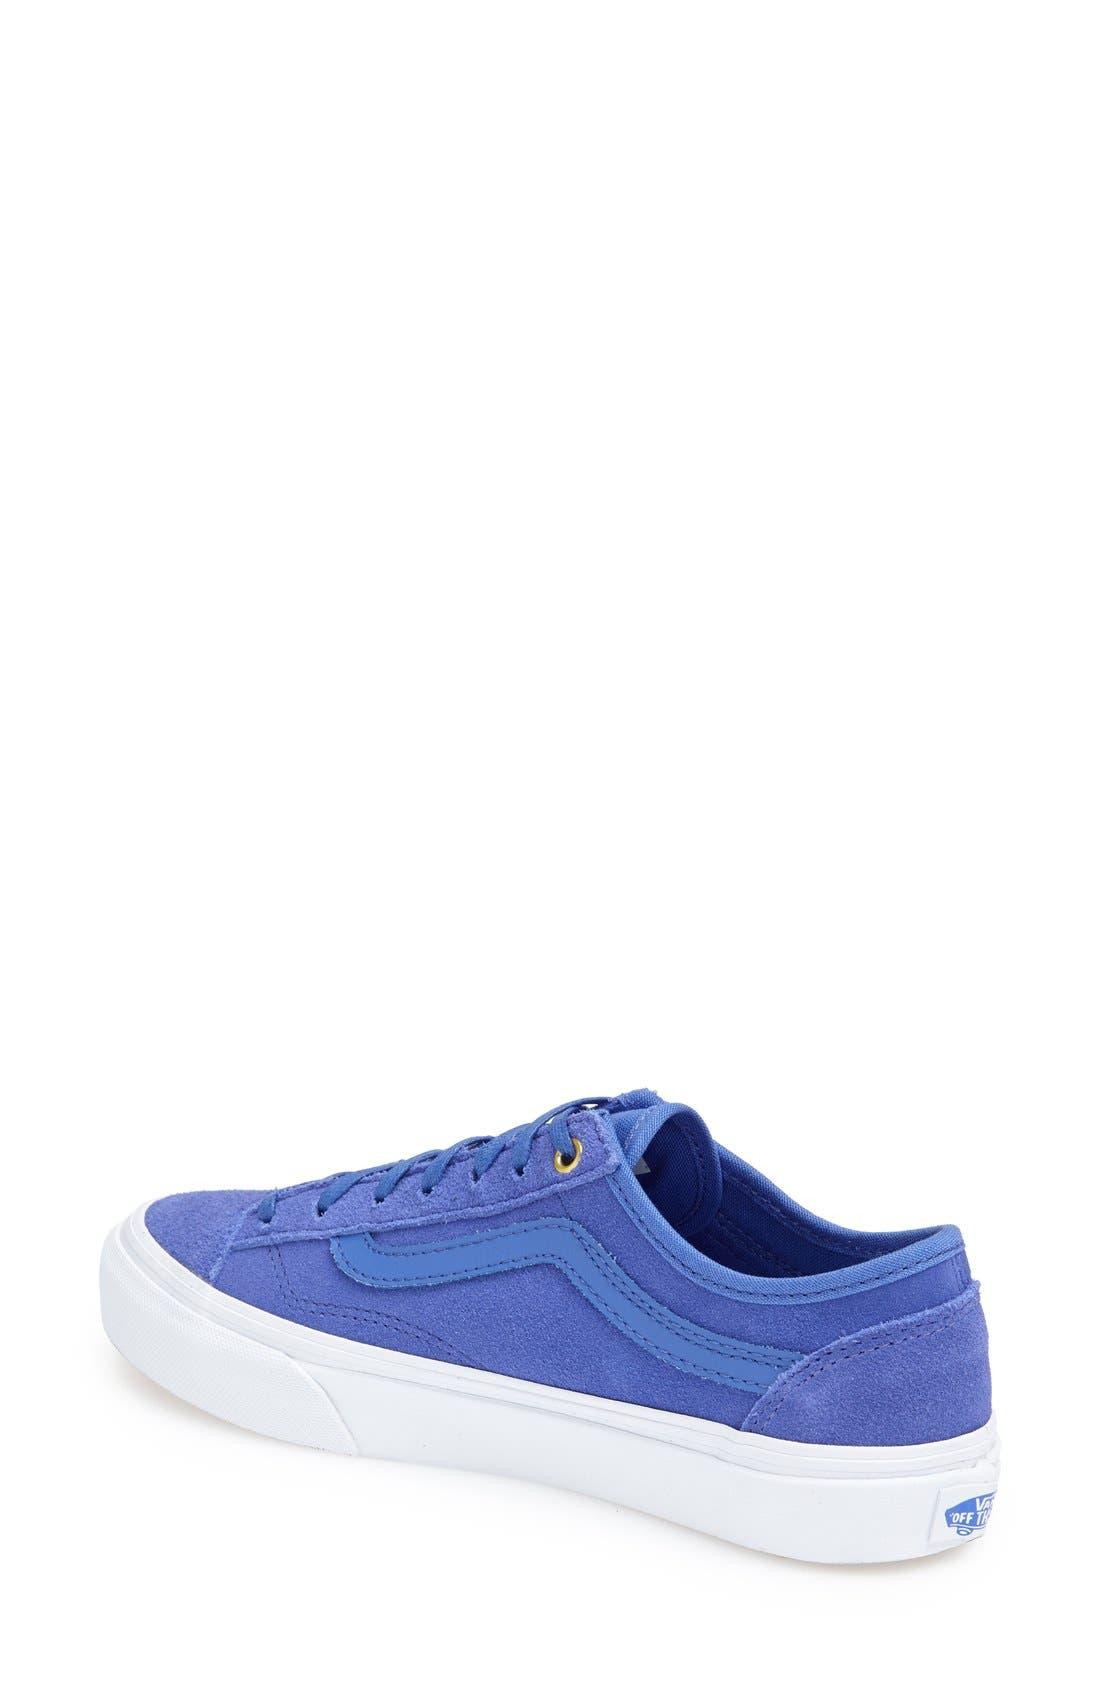 Alternate Image 2  - Vans 'Style 36' Slim Sneaker (Women)